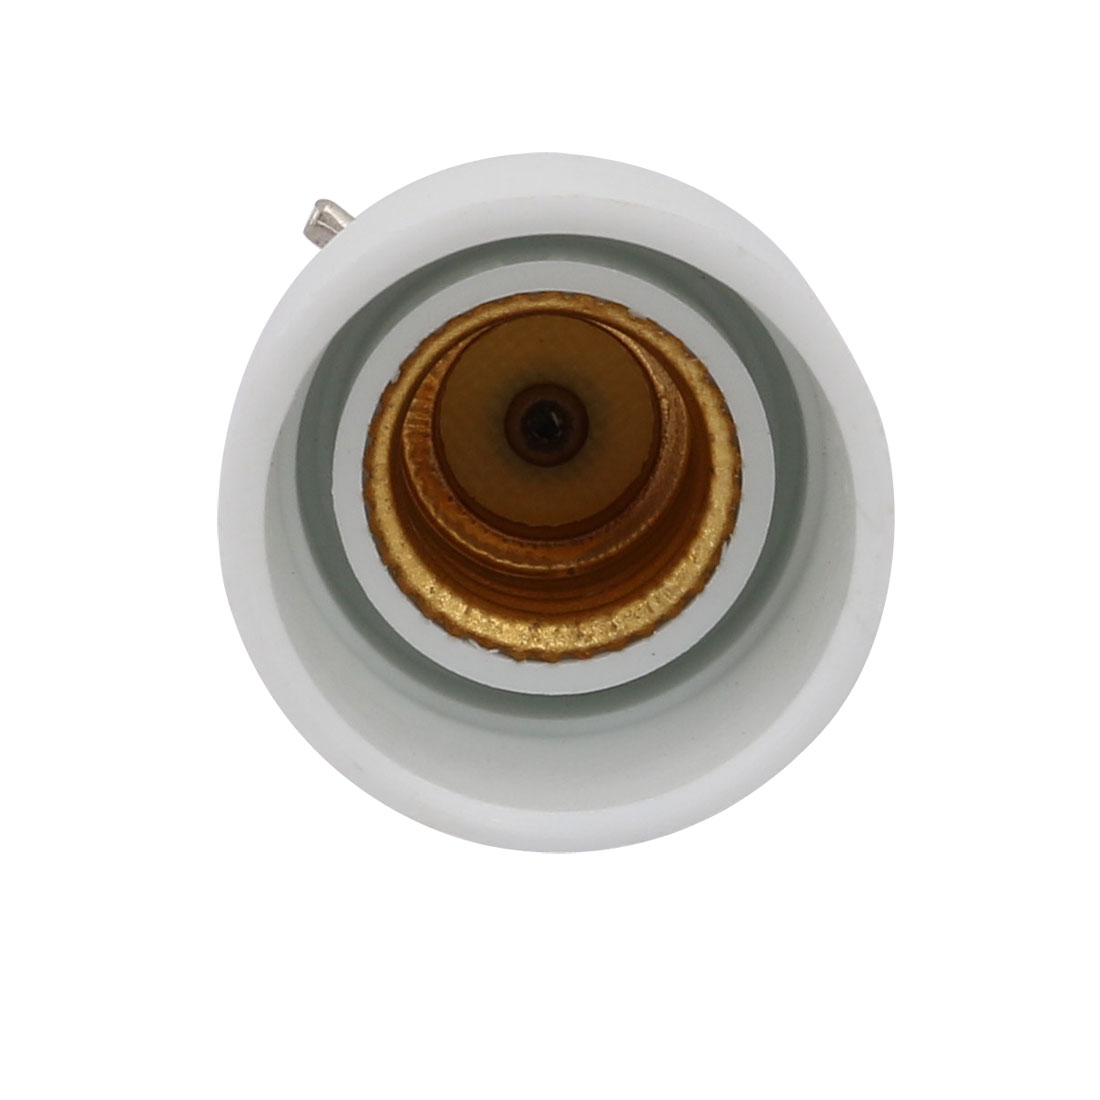 Unique Bargains 10pcs B22 to E14 Extender Adapter Converter Lamp Bulb Socket Holder White - image 1 de 2